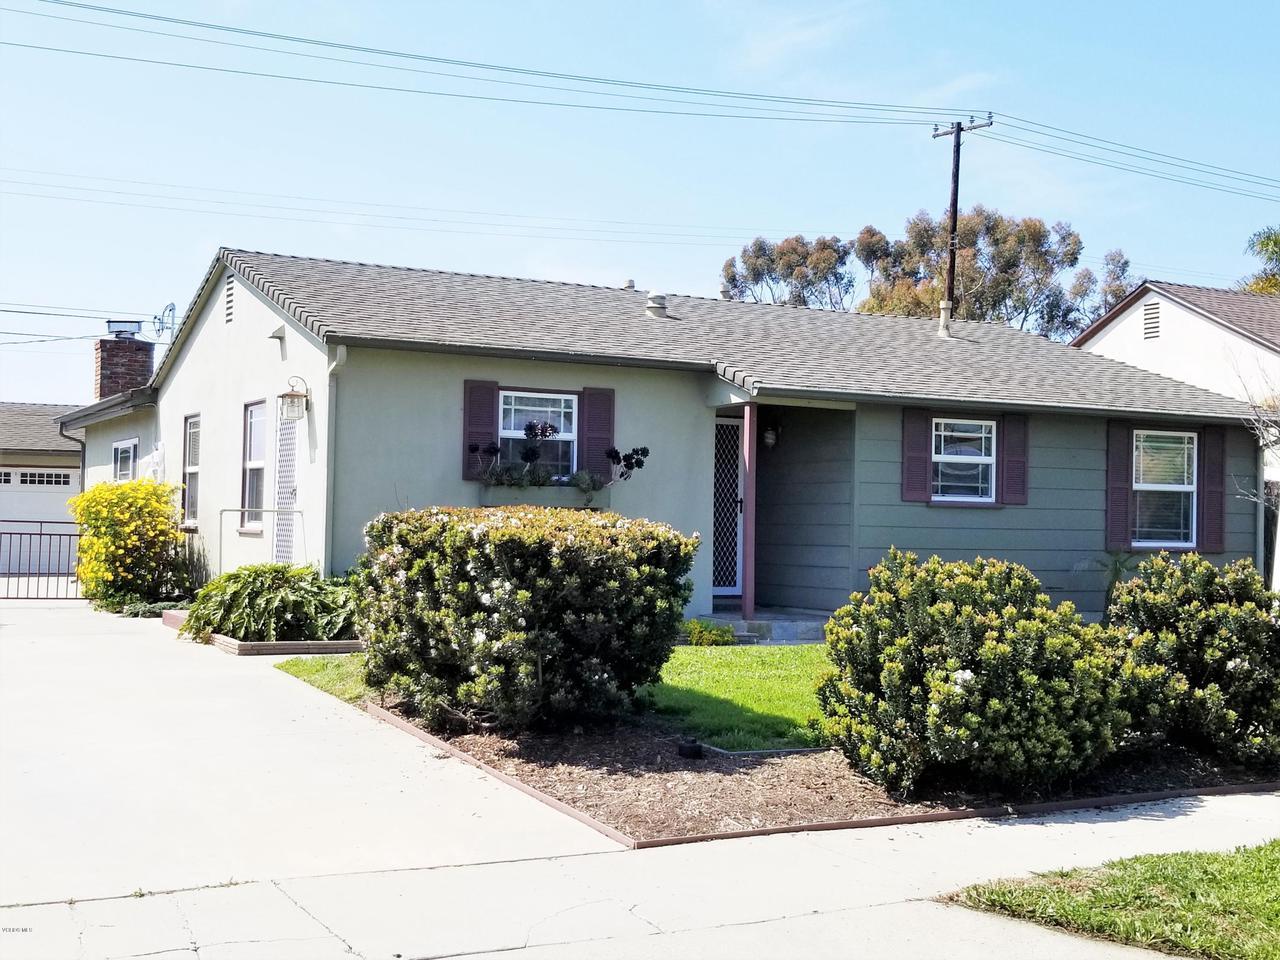 2764 CHANNEL, Ventura, CA 93003 - Midtown Charmer